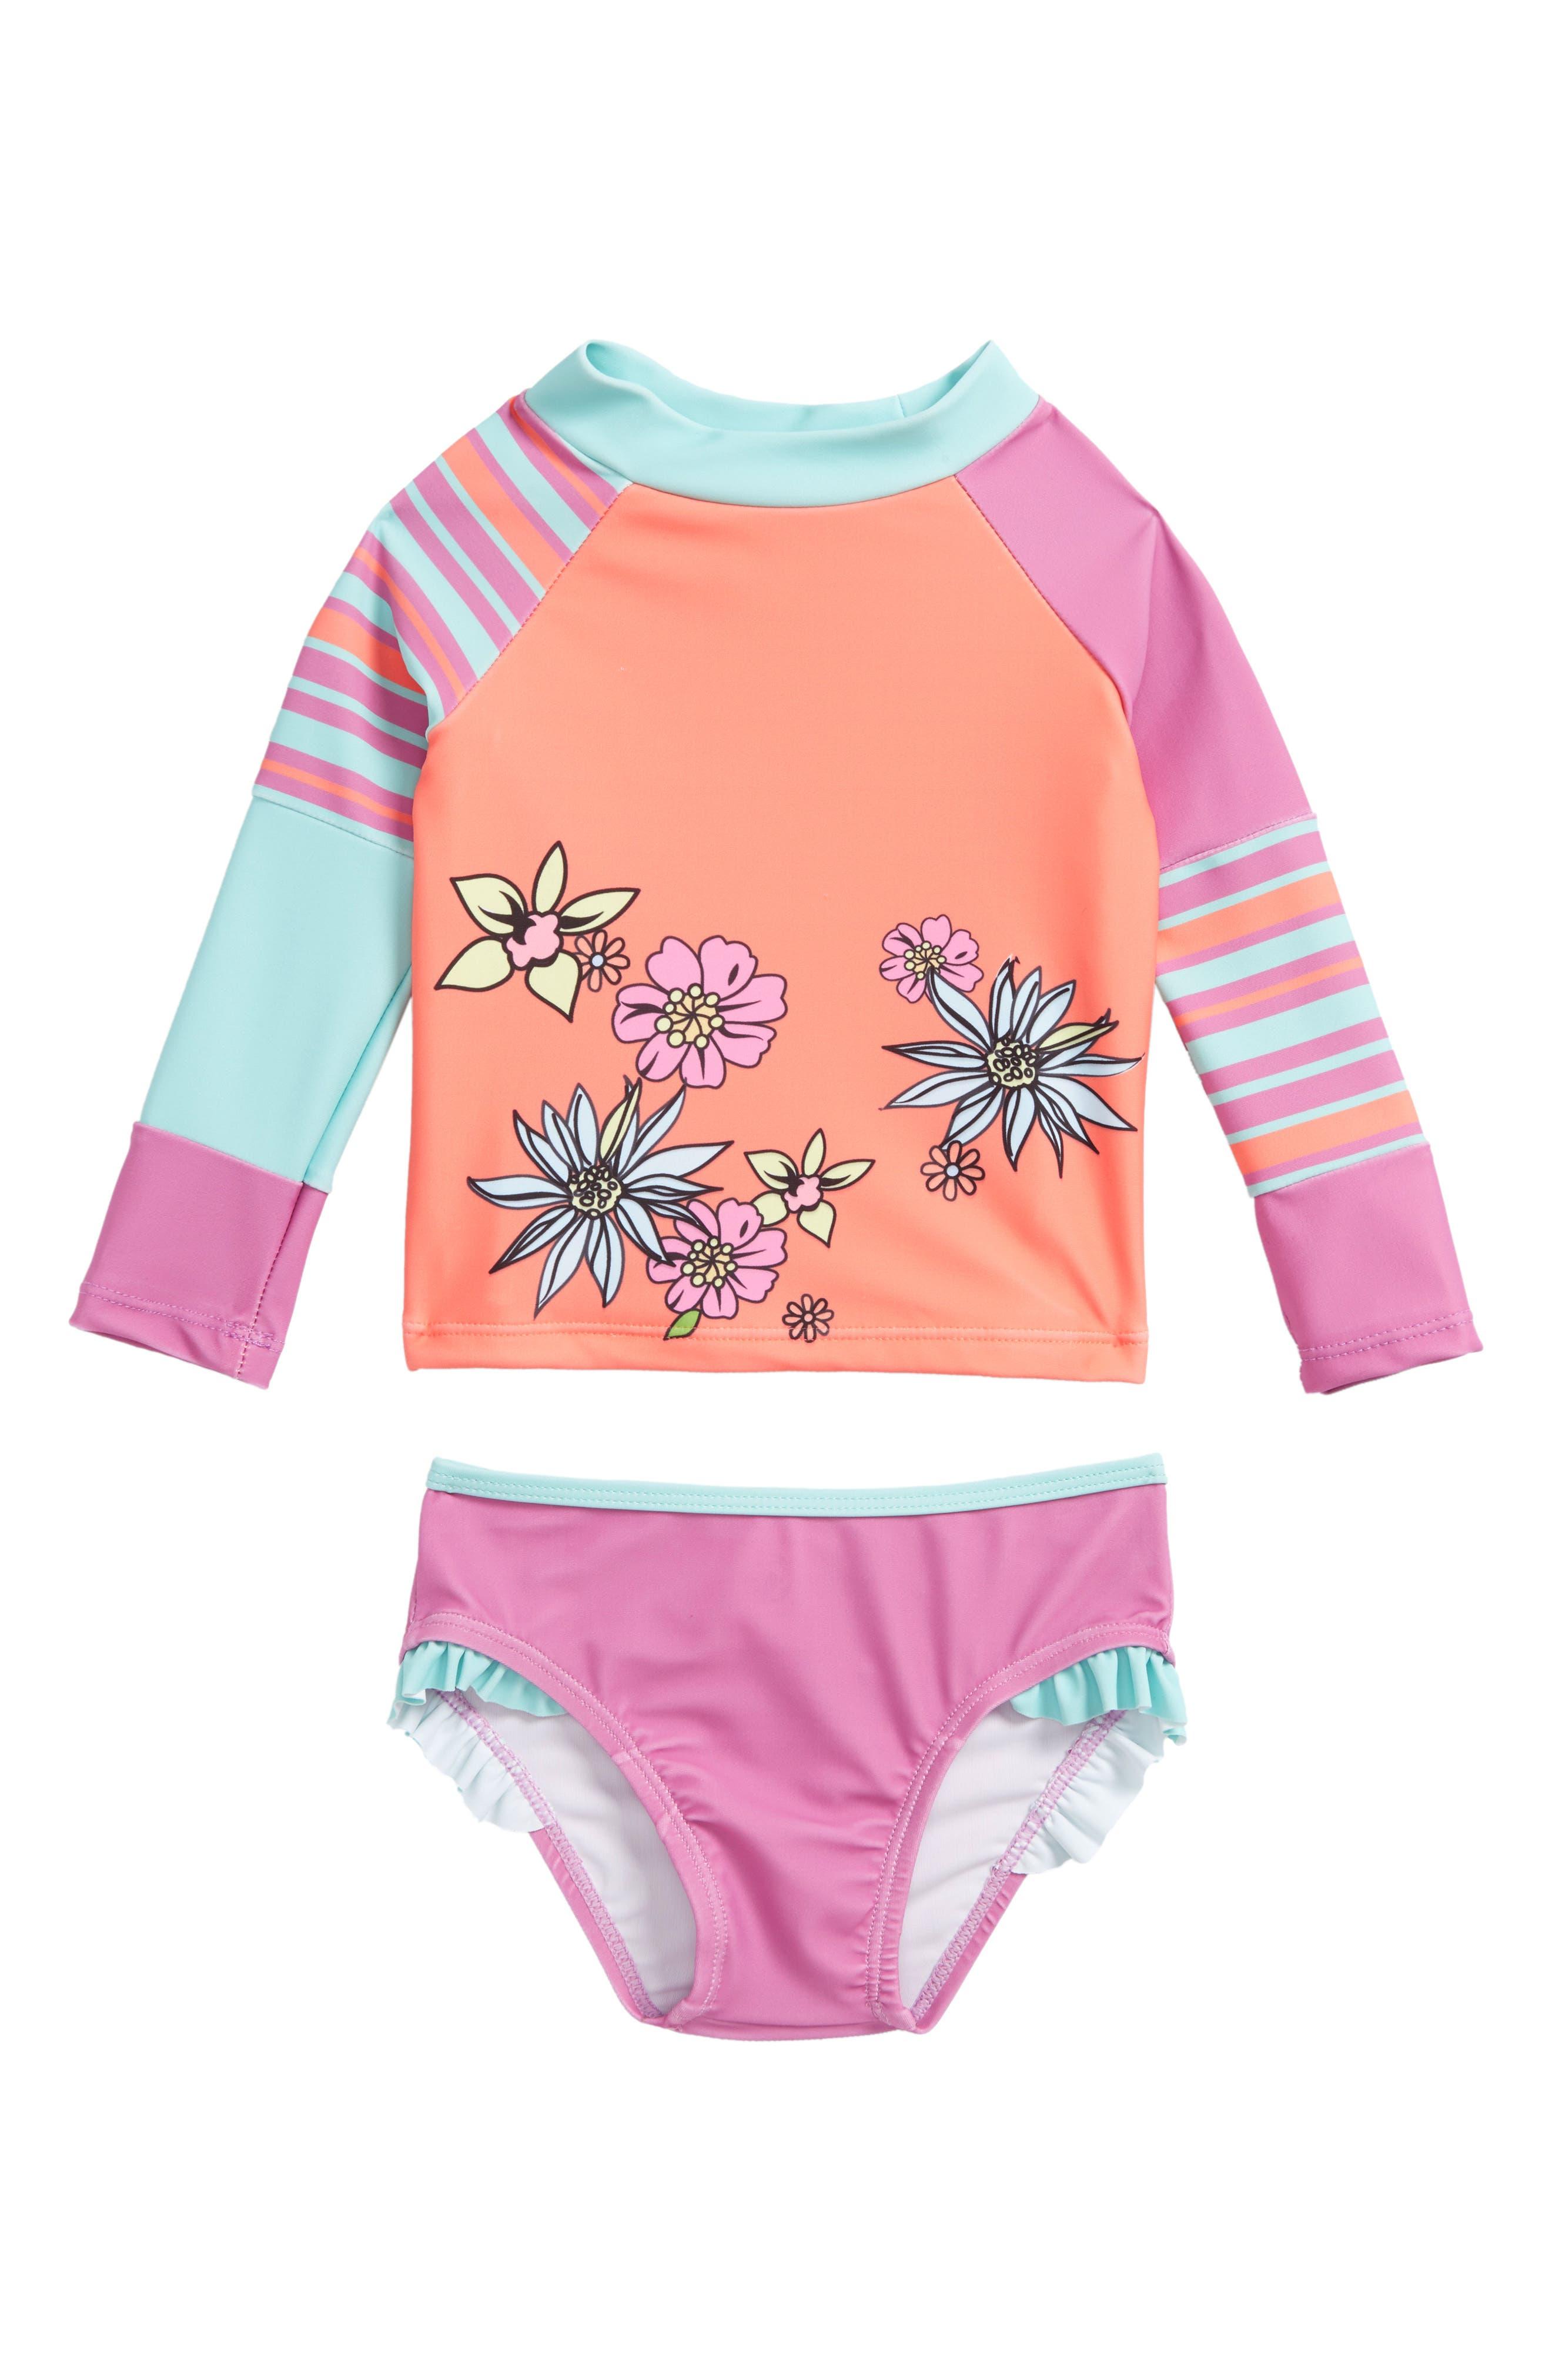 Two-Piece Rashguard Swimsuit,                         Main,                         color, Orange